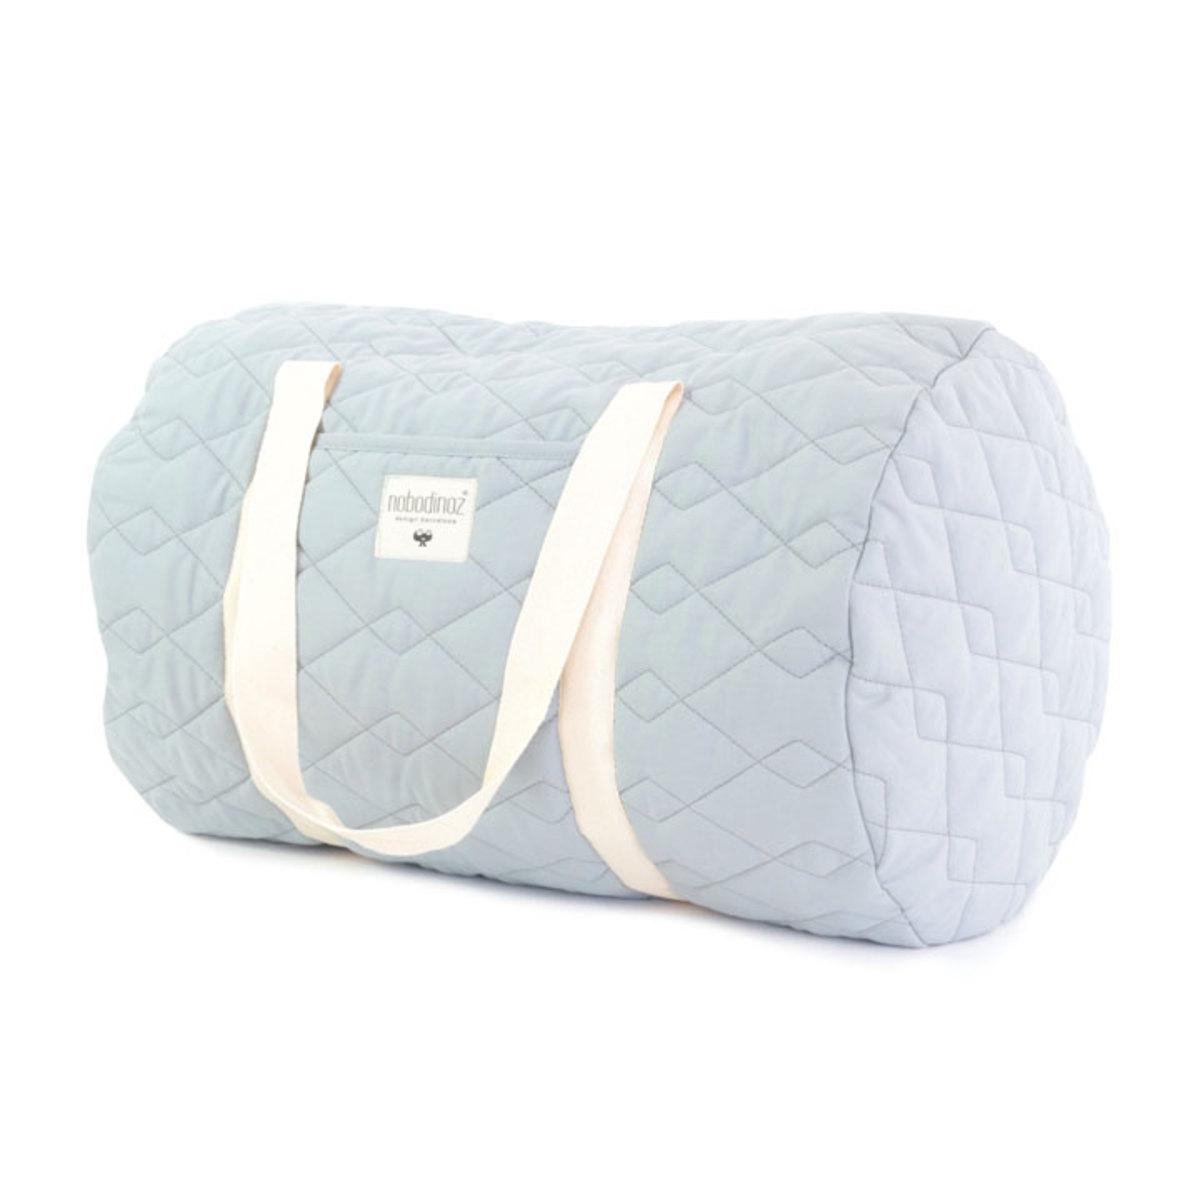 sac week end los angeles pure line bleu riviera 2000000090221 achat vente sac langer. Black Bedroom Furniture Sets. Home Design Ideas